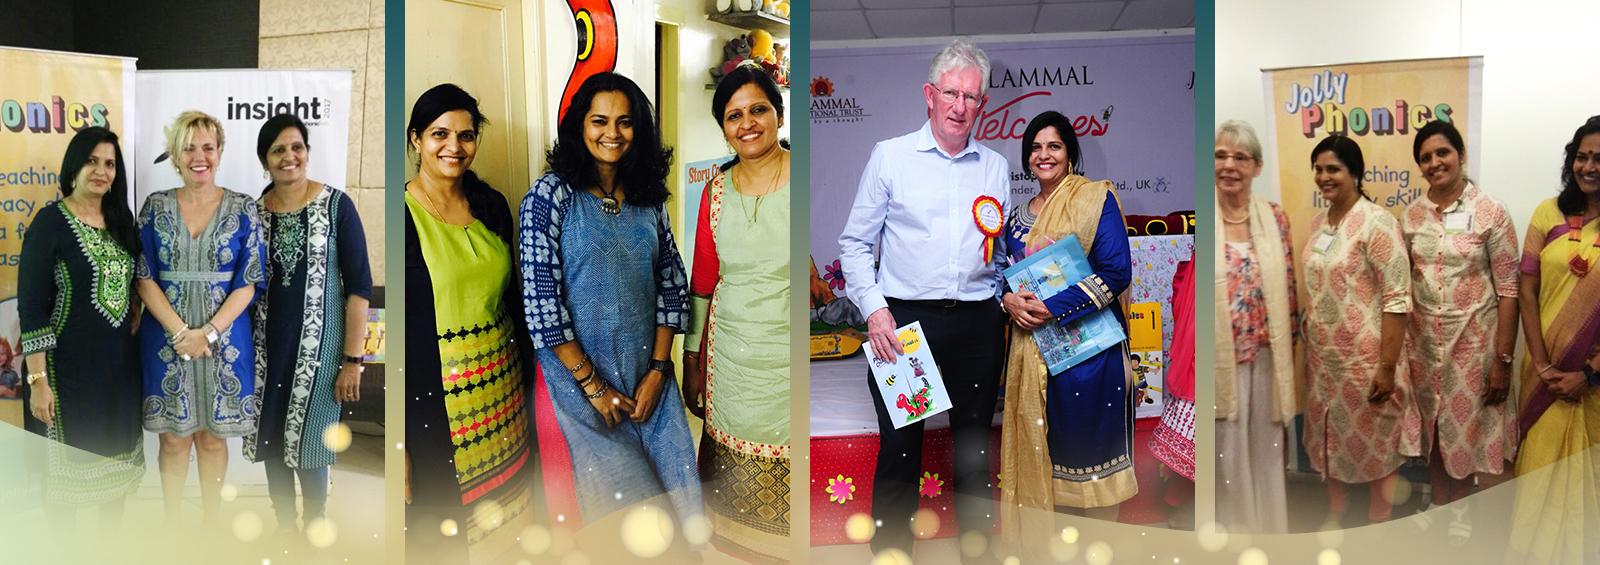 Phonics Classes For Kids Anna Nagar Chennai Jolly Phonics